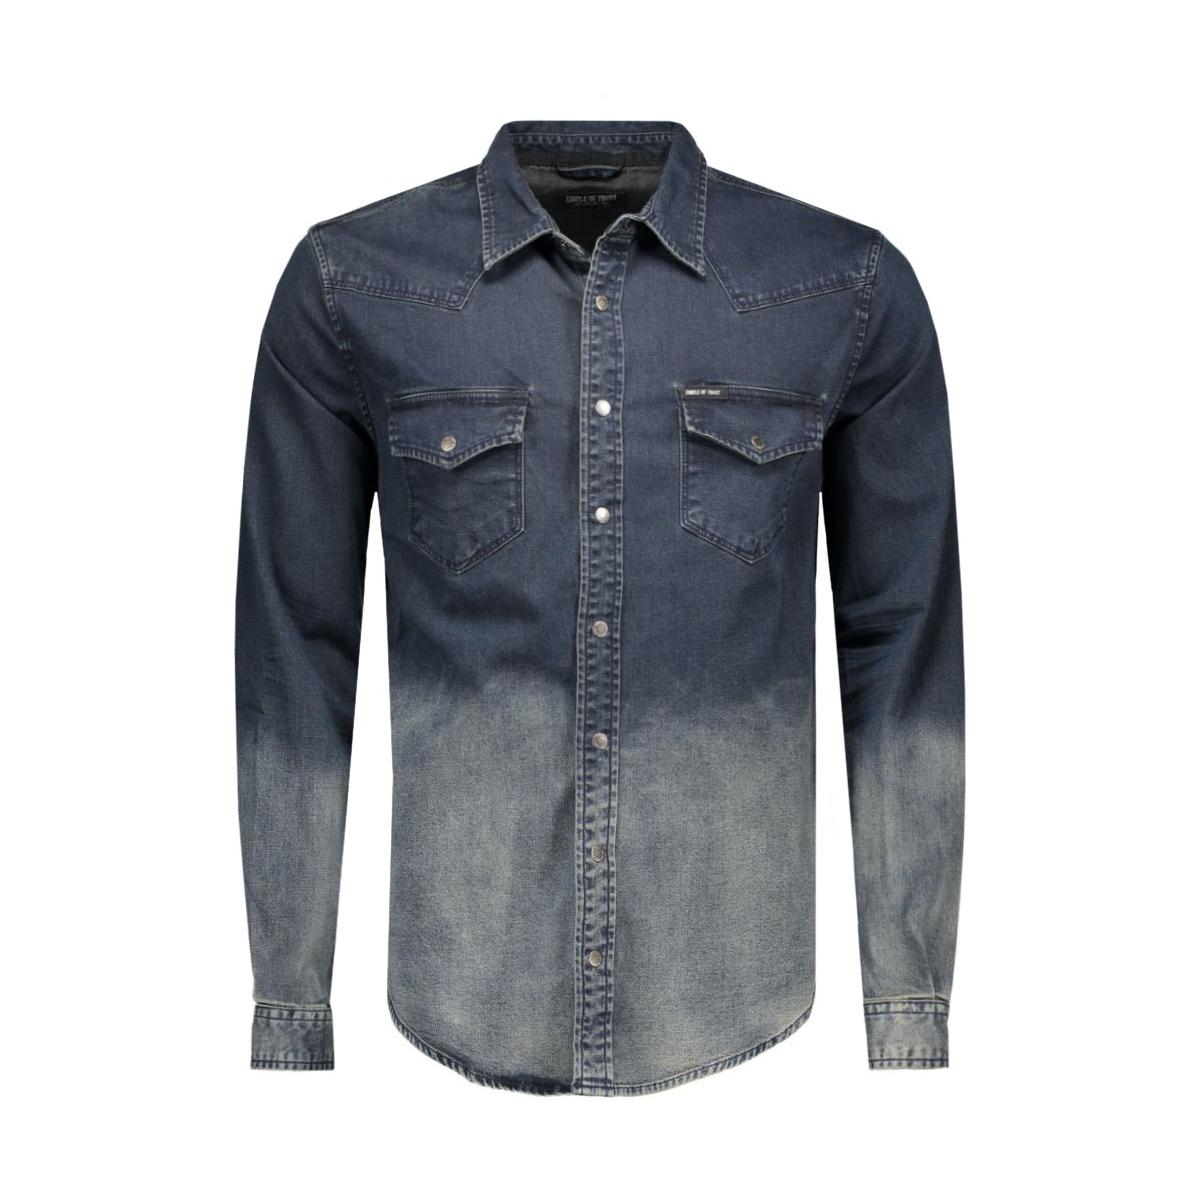 hw16.11.4432 jason shirt circle of trust overhemd steel